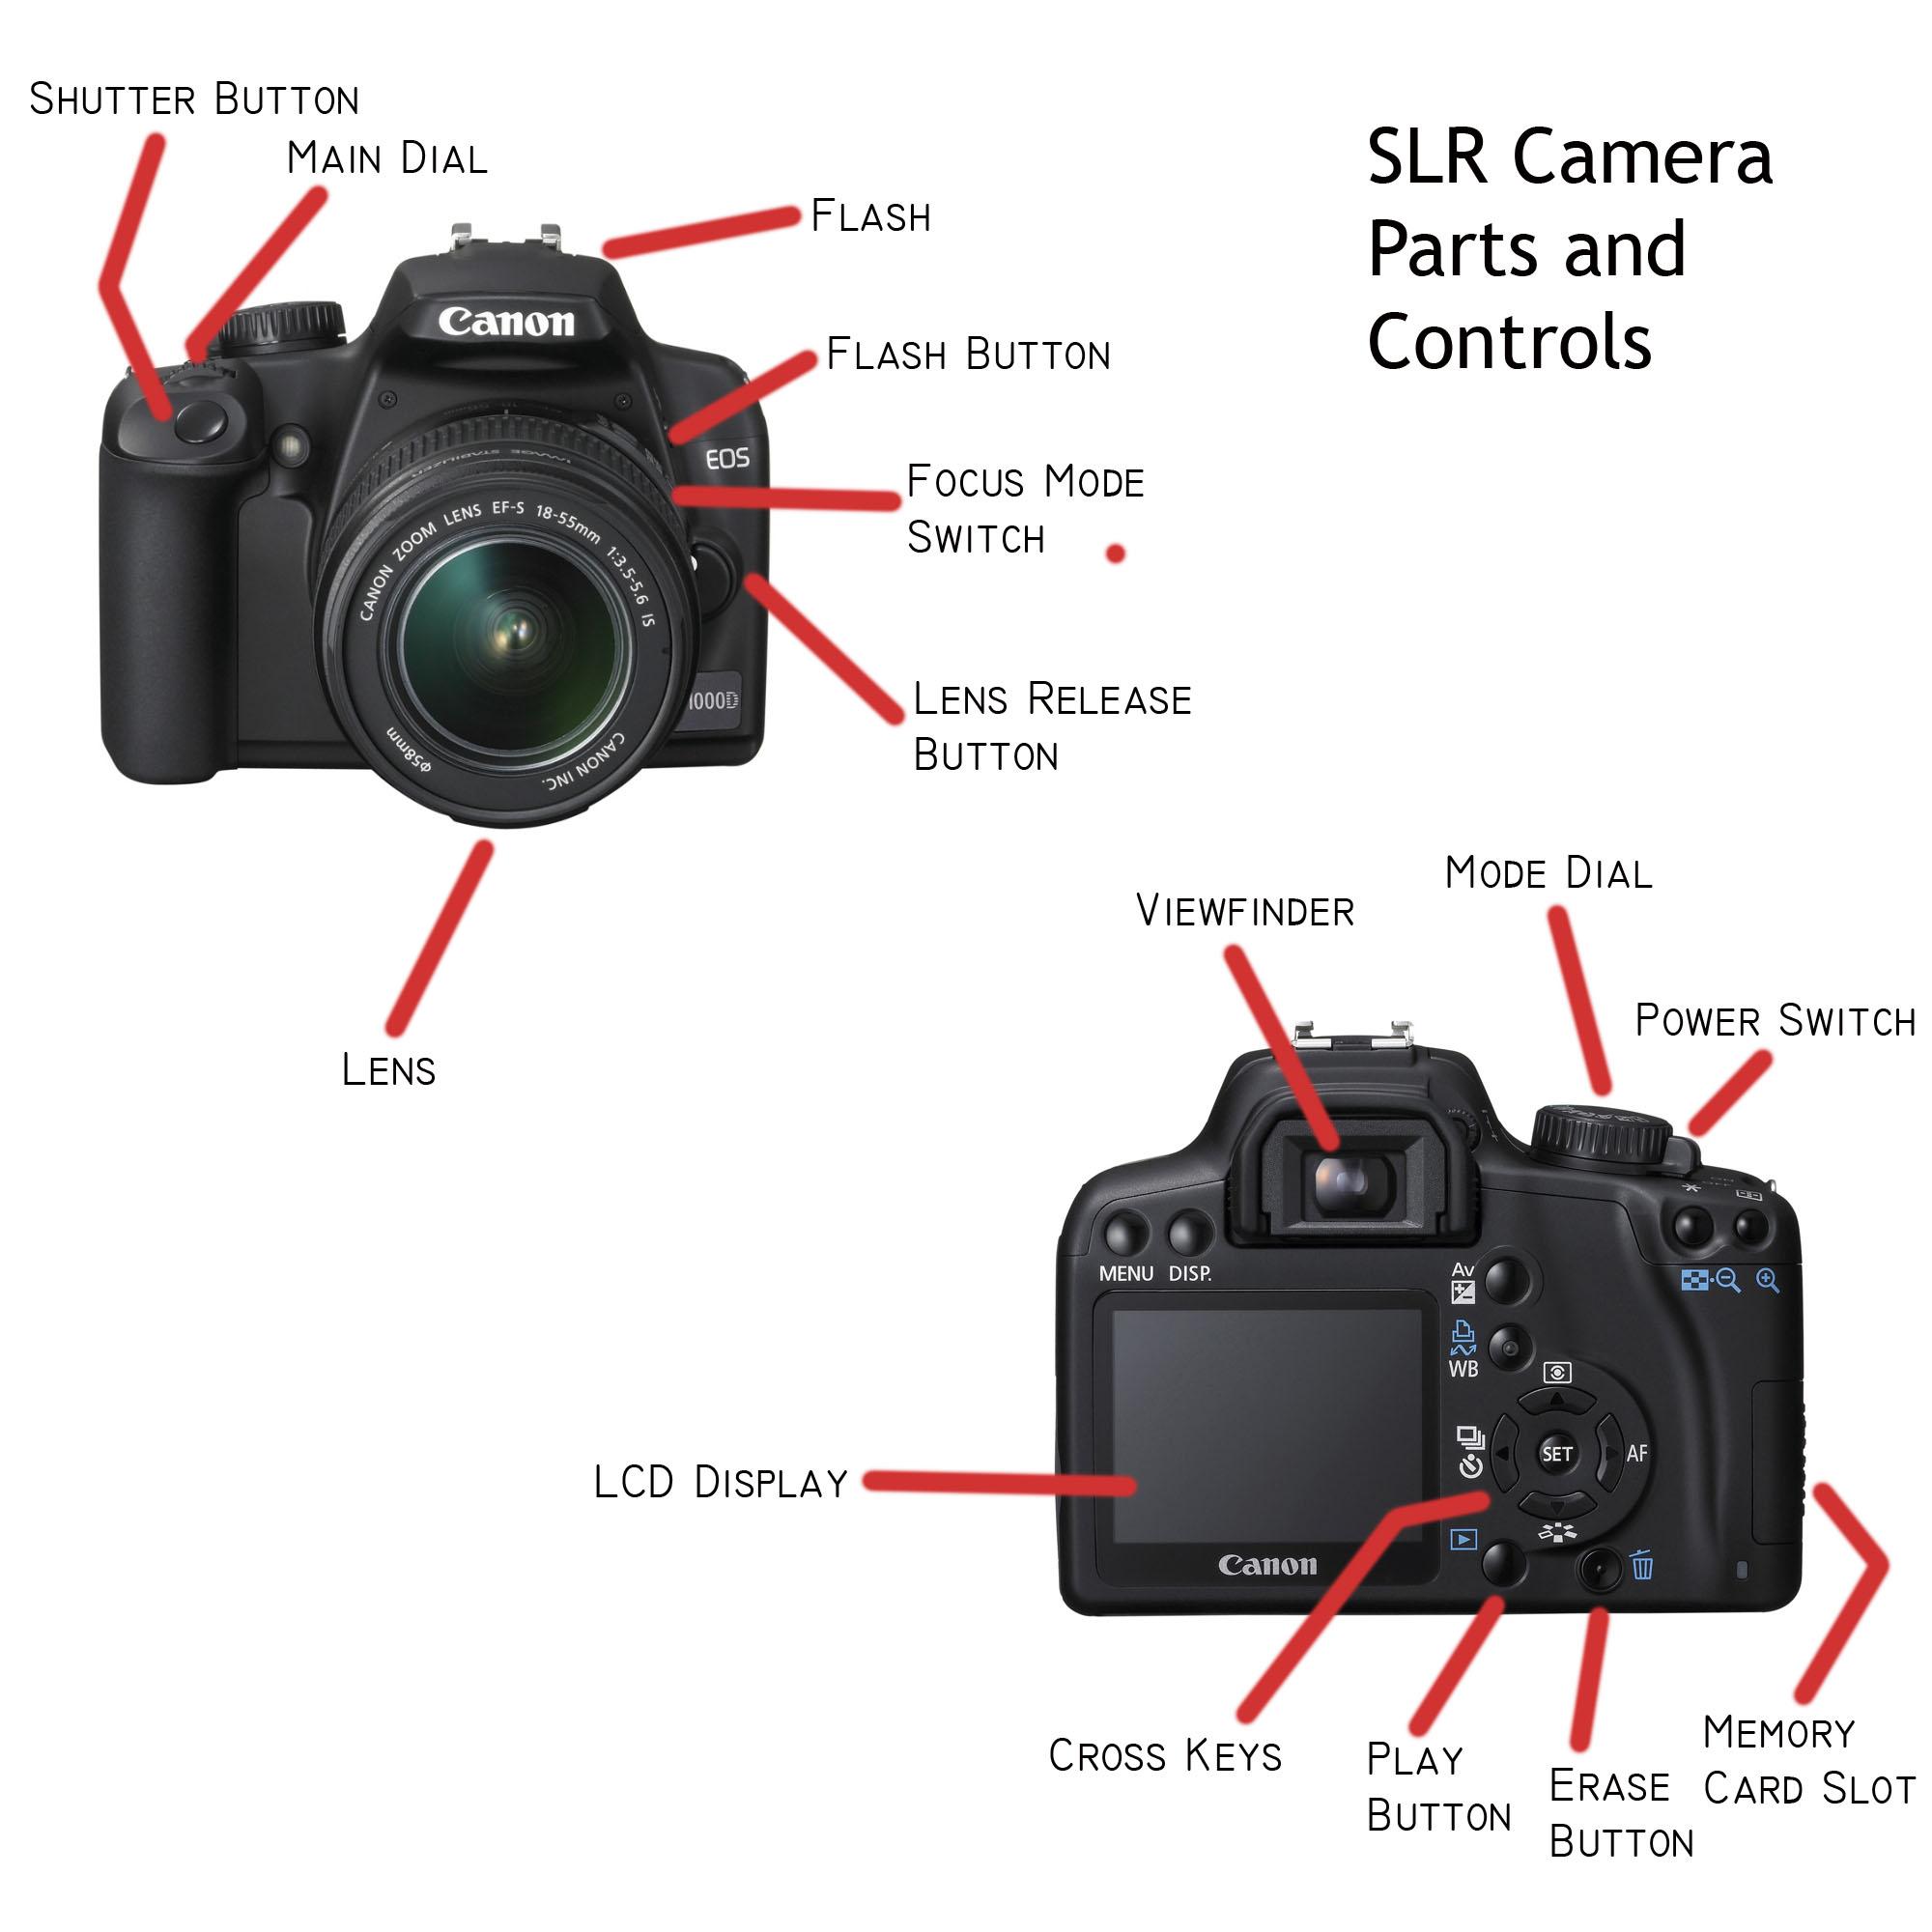 Slr Camera Parts And Controls